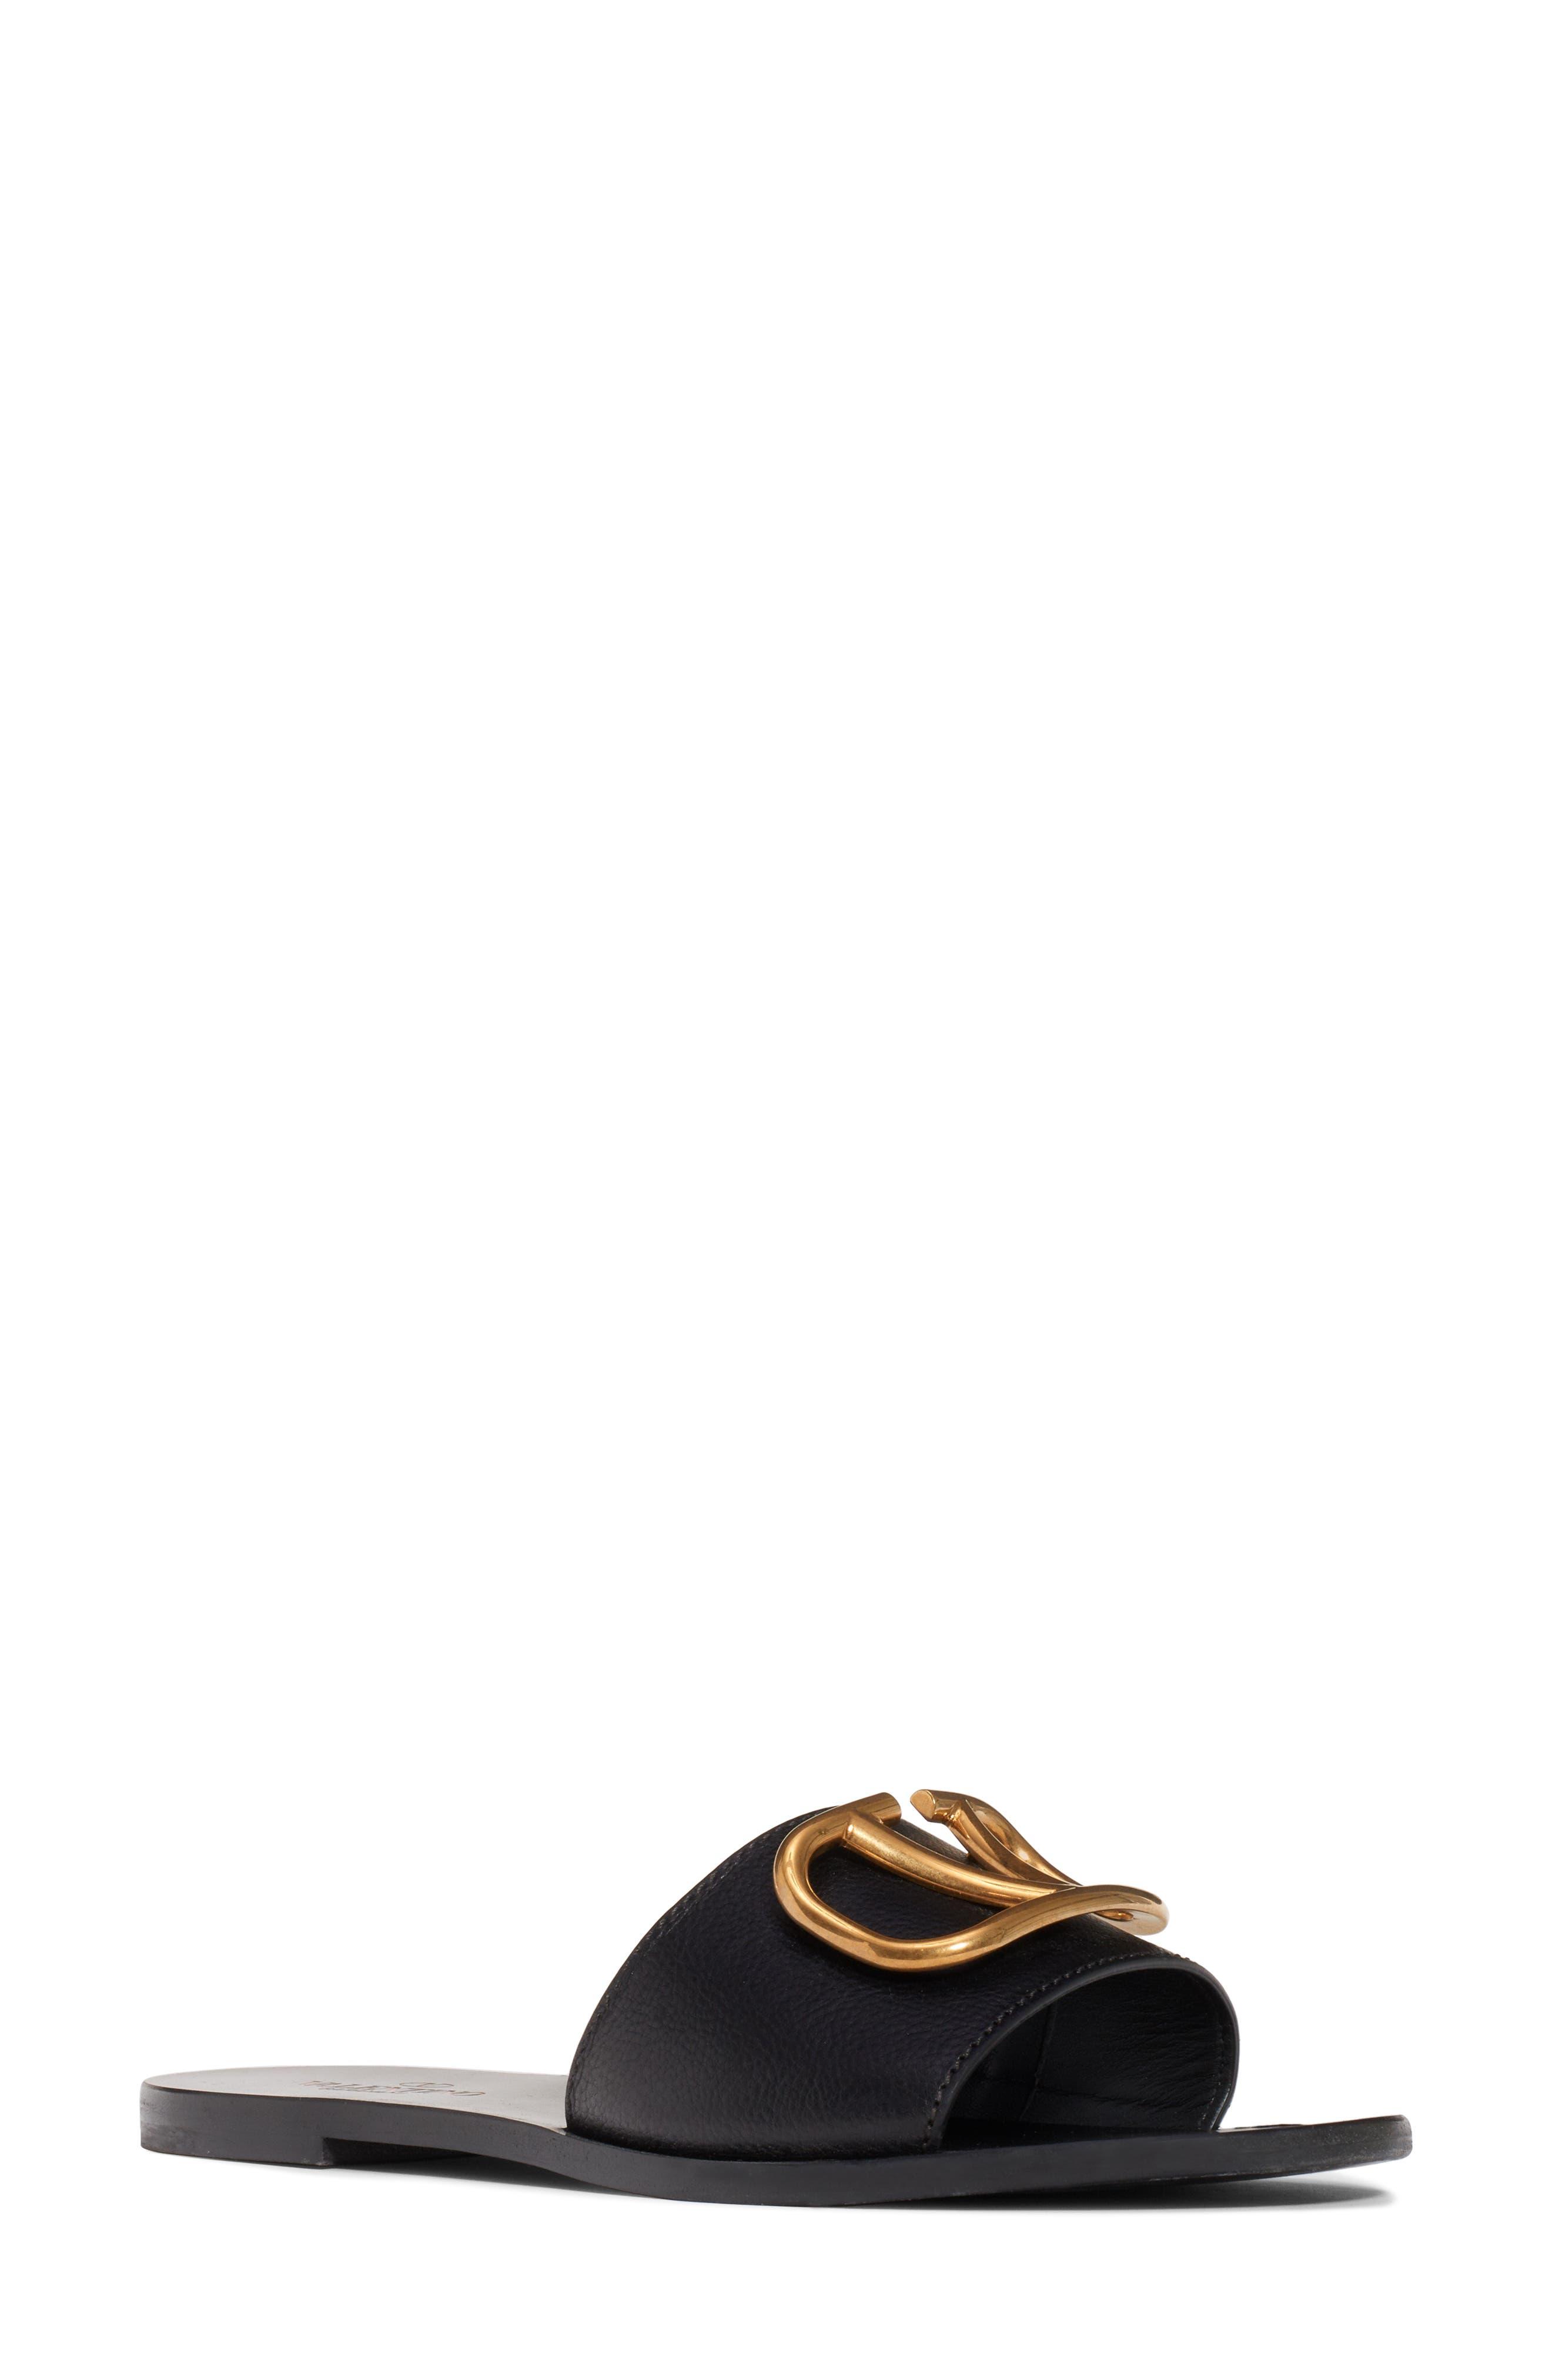 VALENTINO GARAVANI, Brooch Slide Sandal, Main thumbnail 1, color, BLACK